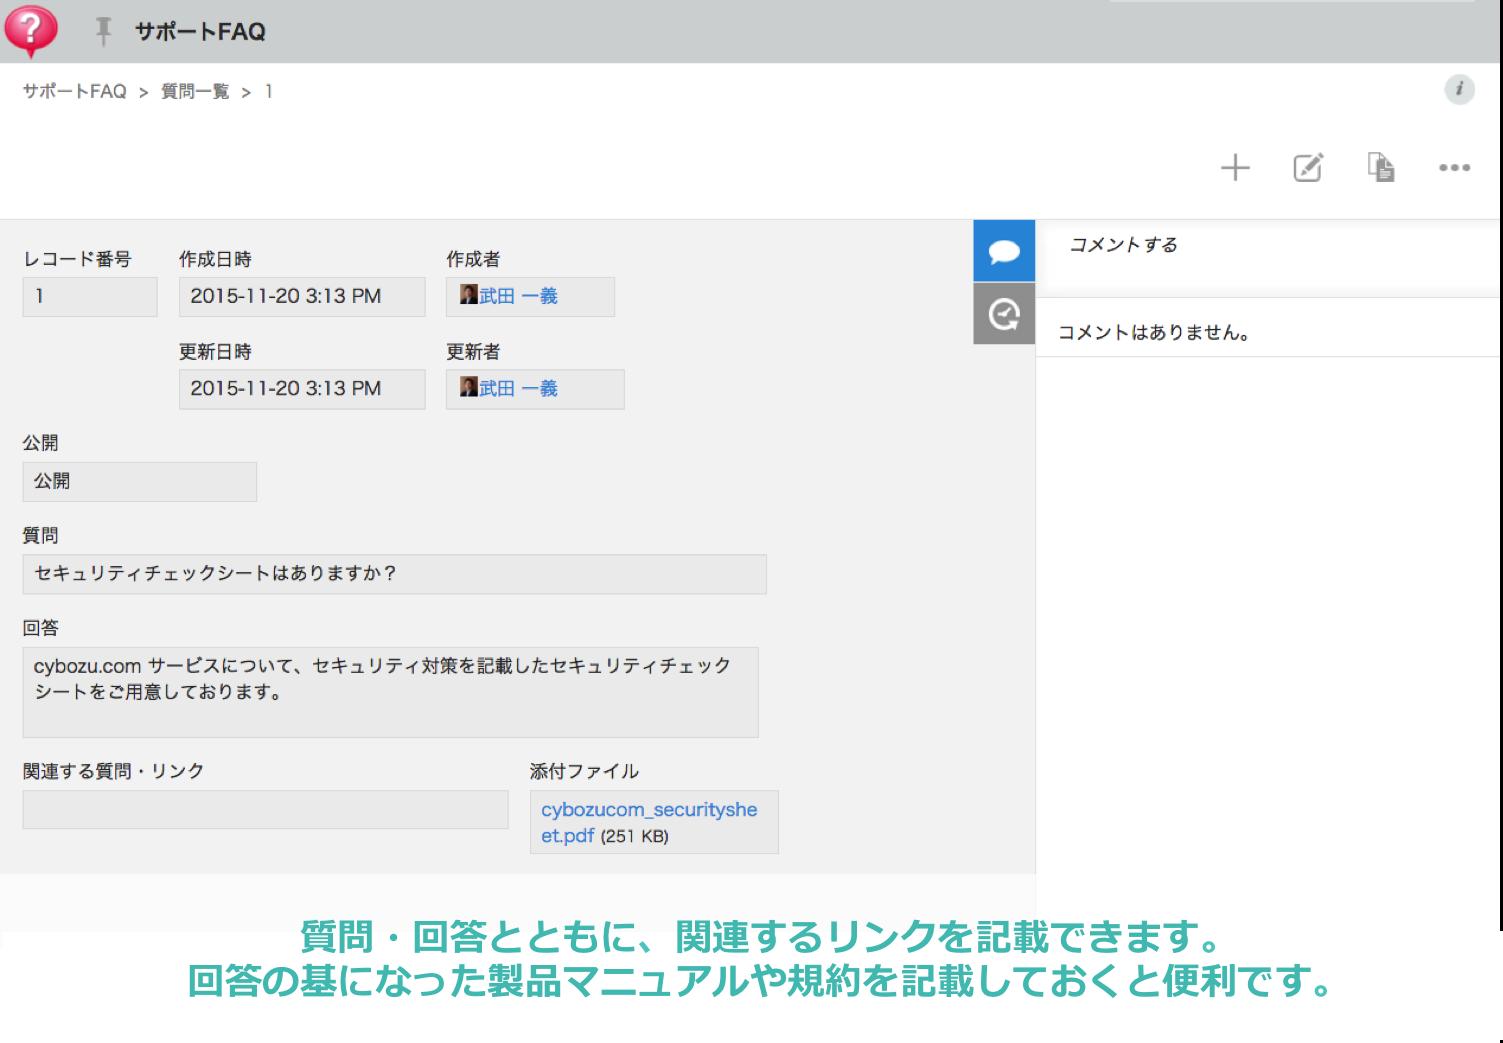 image03_FAQ.png